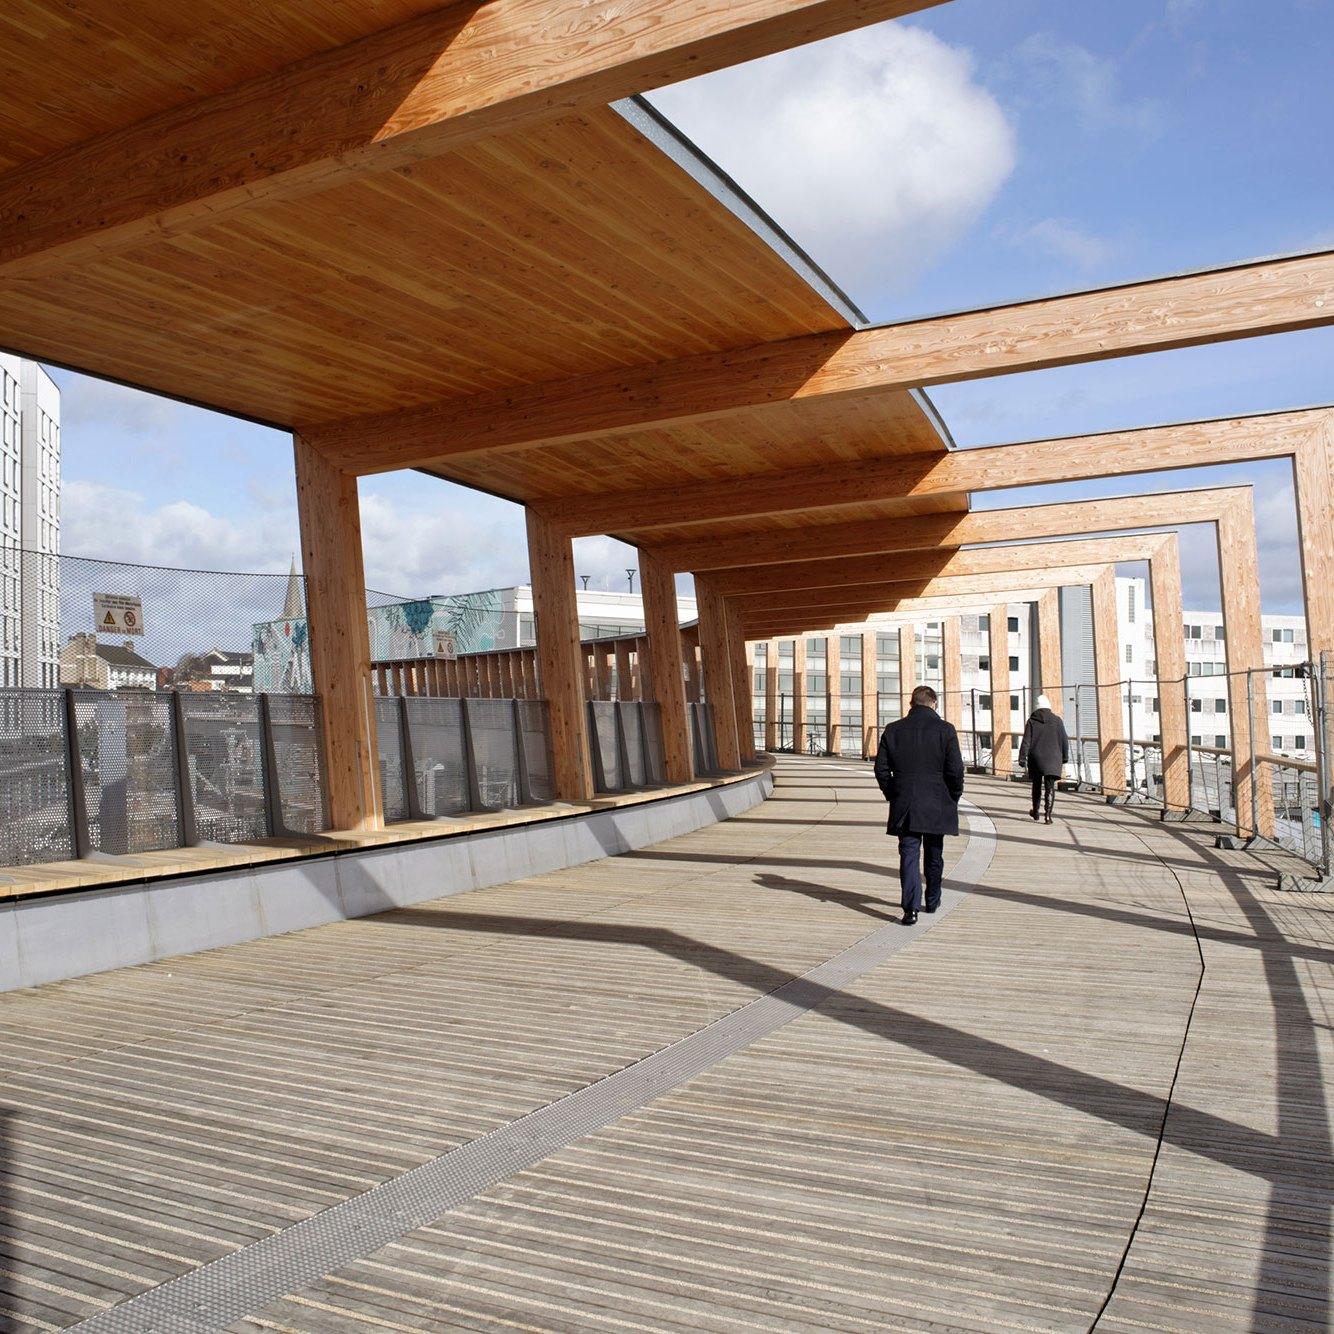 Span -Footbridge at Angers Saint-Laud TGV Train Station / Dietmar Feichtinger Architectes (DFA)